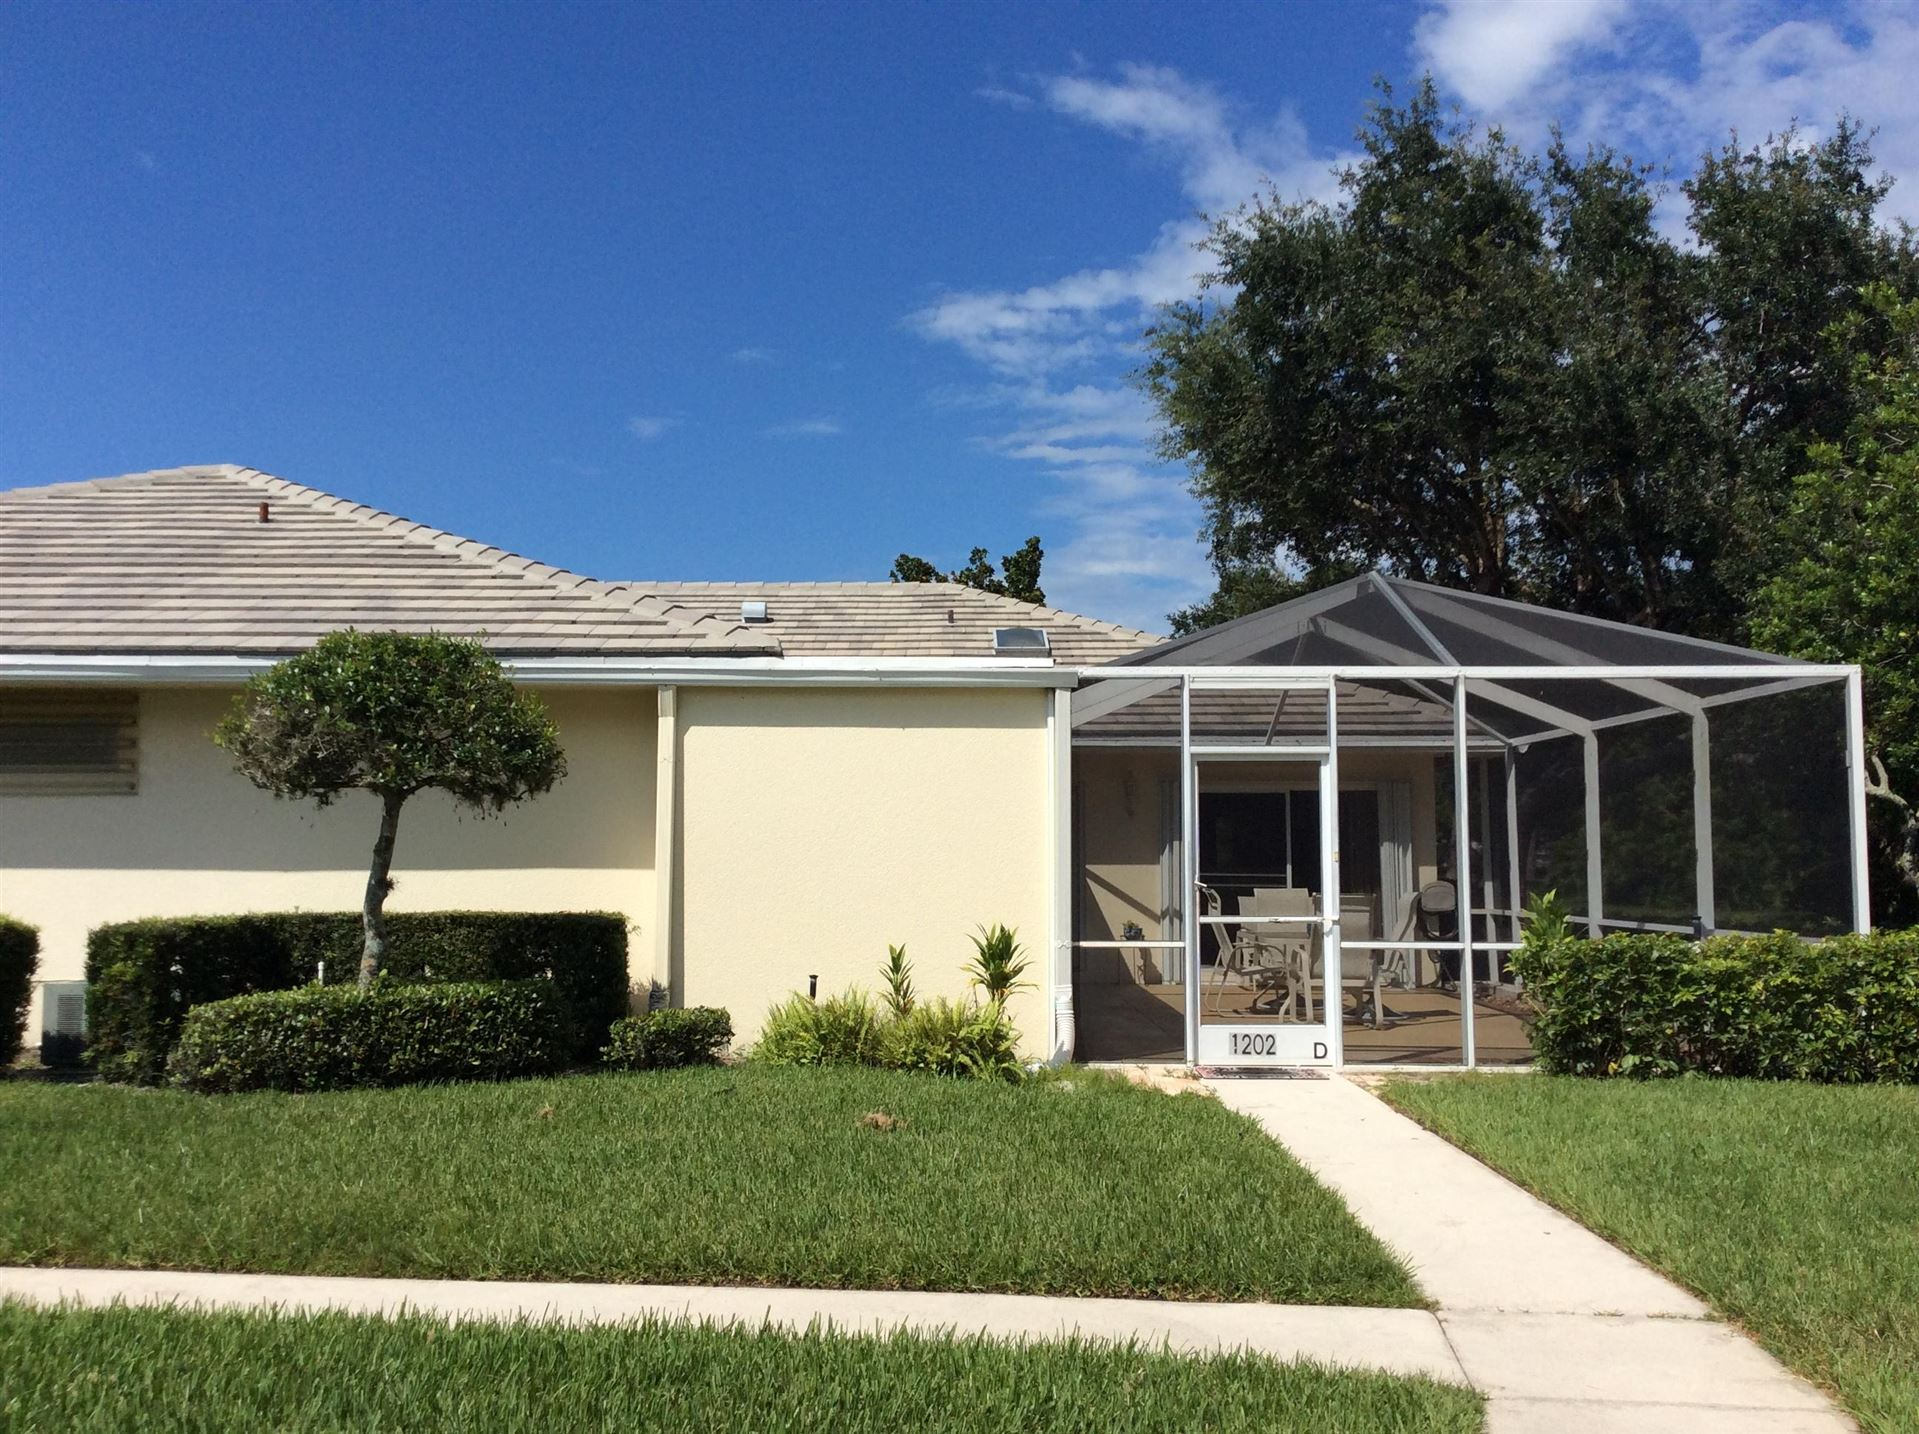 1202 NW Sun Terrace Circle #24d, Port Saint Lucie, FL 34986 - #: RX-10634346